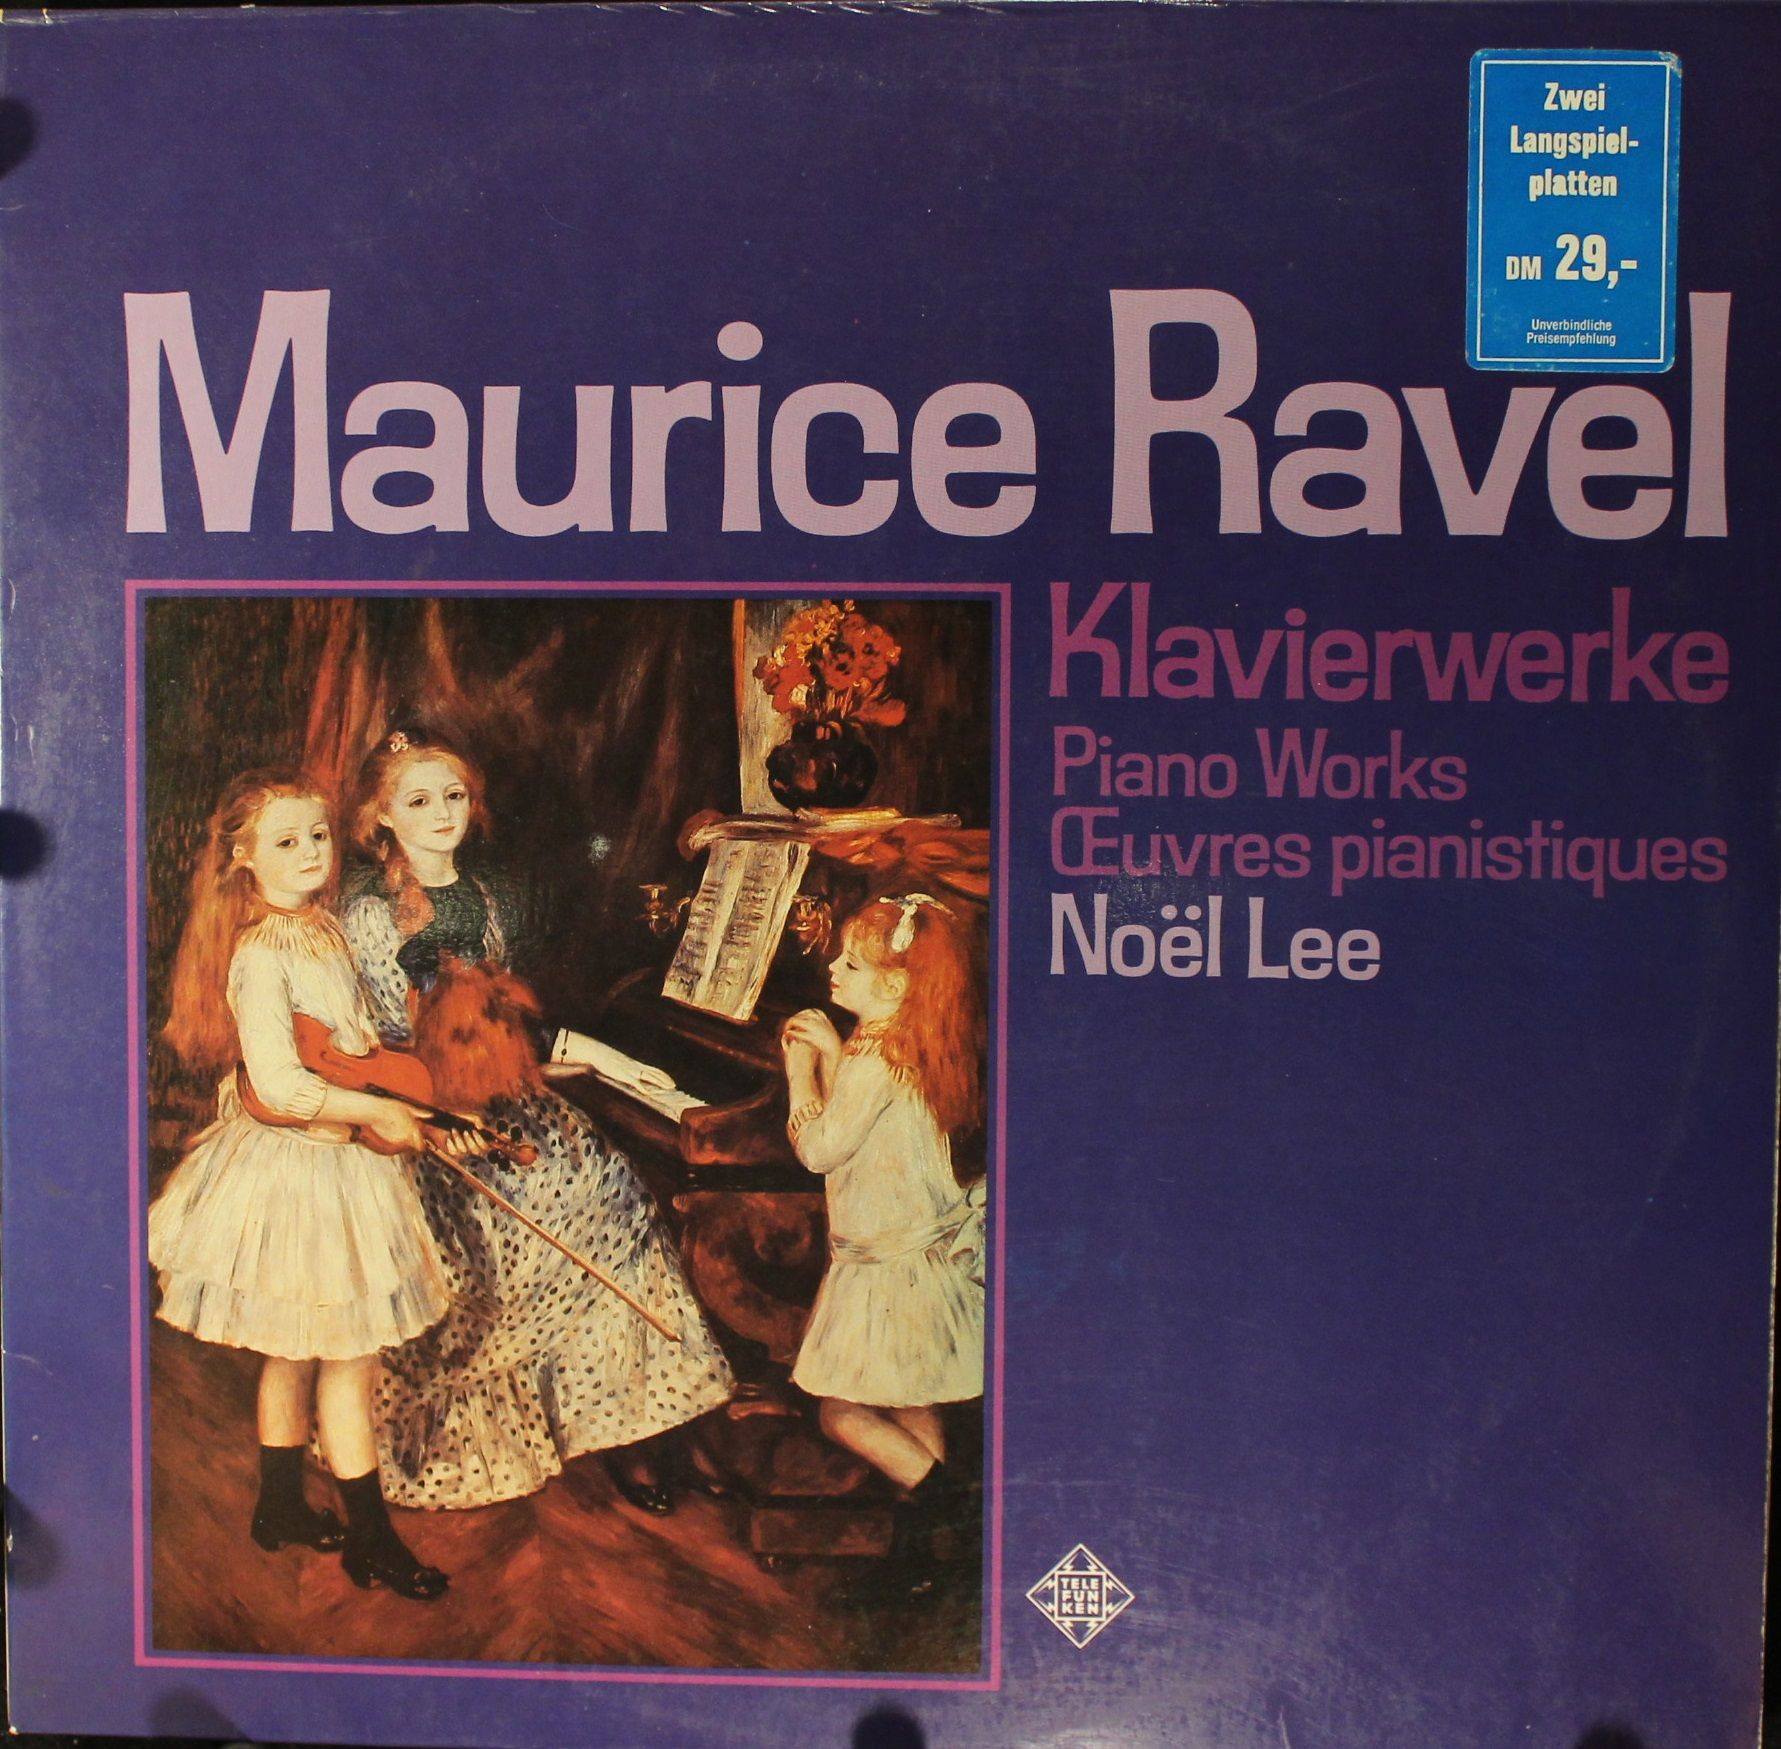 Ravel - Klavierwerke - 33T x 2